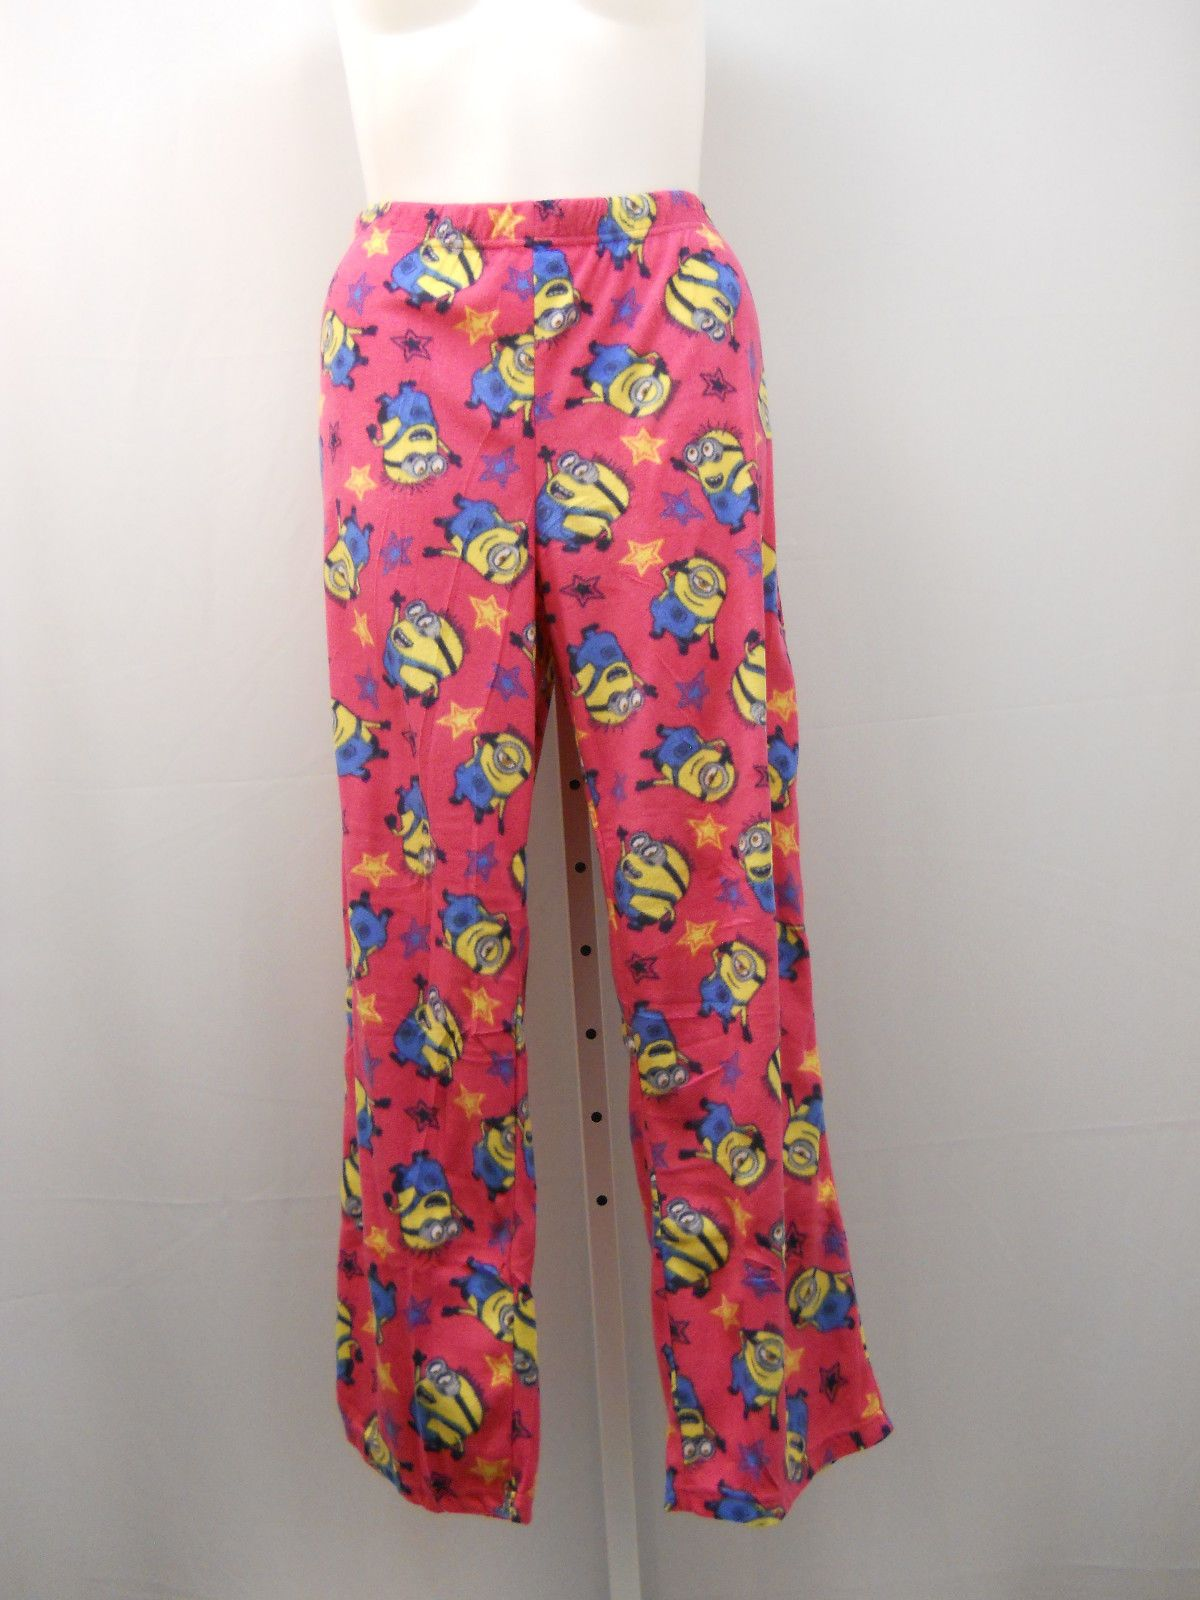 28842879144926 Despicable Me Minions Woman s Pajama Bottoms Size 20 Pink Micro Fleece  Sleepwear For Sale - Item  1628248